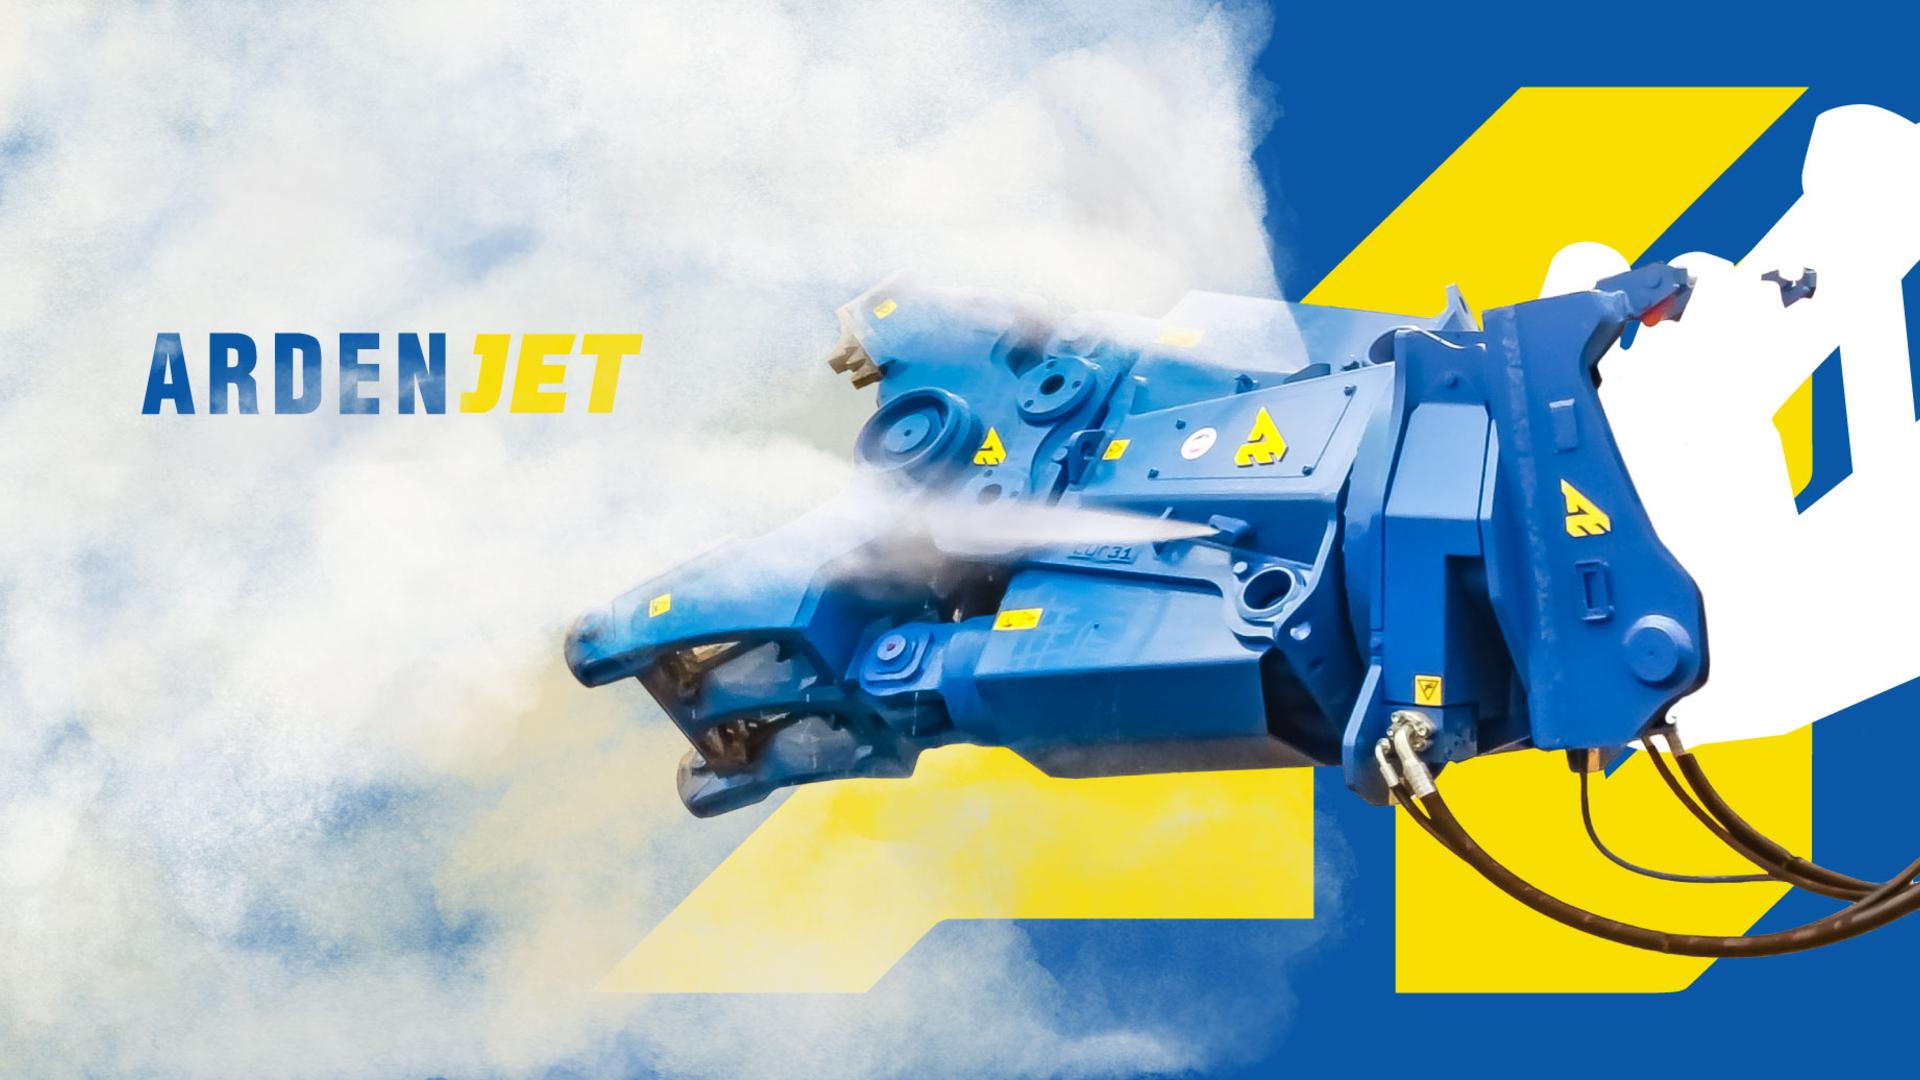 Arden Jet : L'innovation d'AE